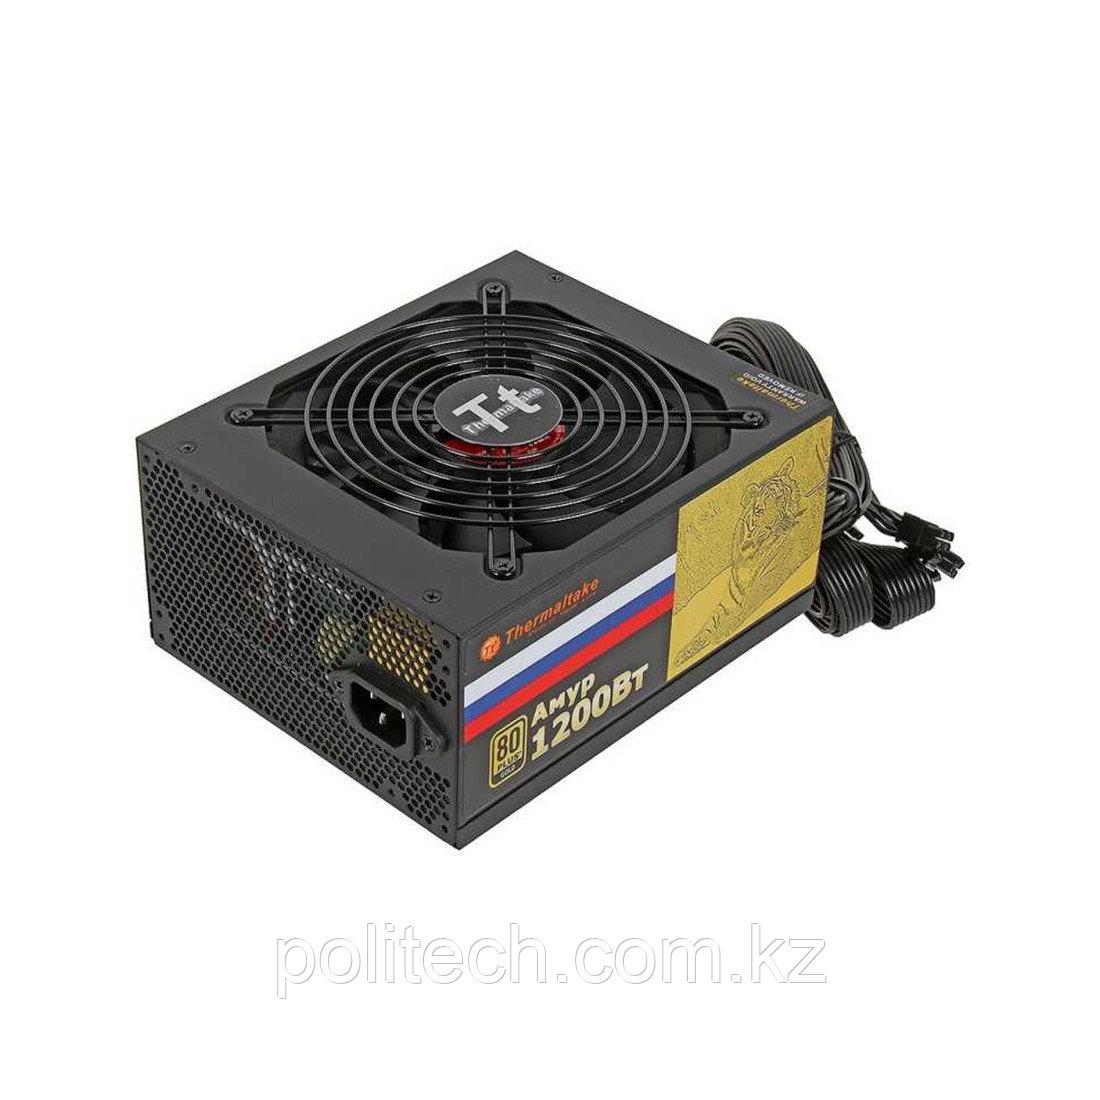 Блок питания Thermaltake RU W Series Amur 1200W (Gold)